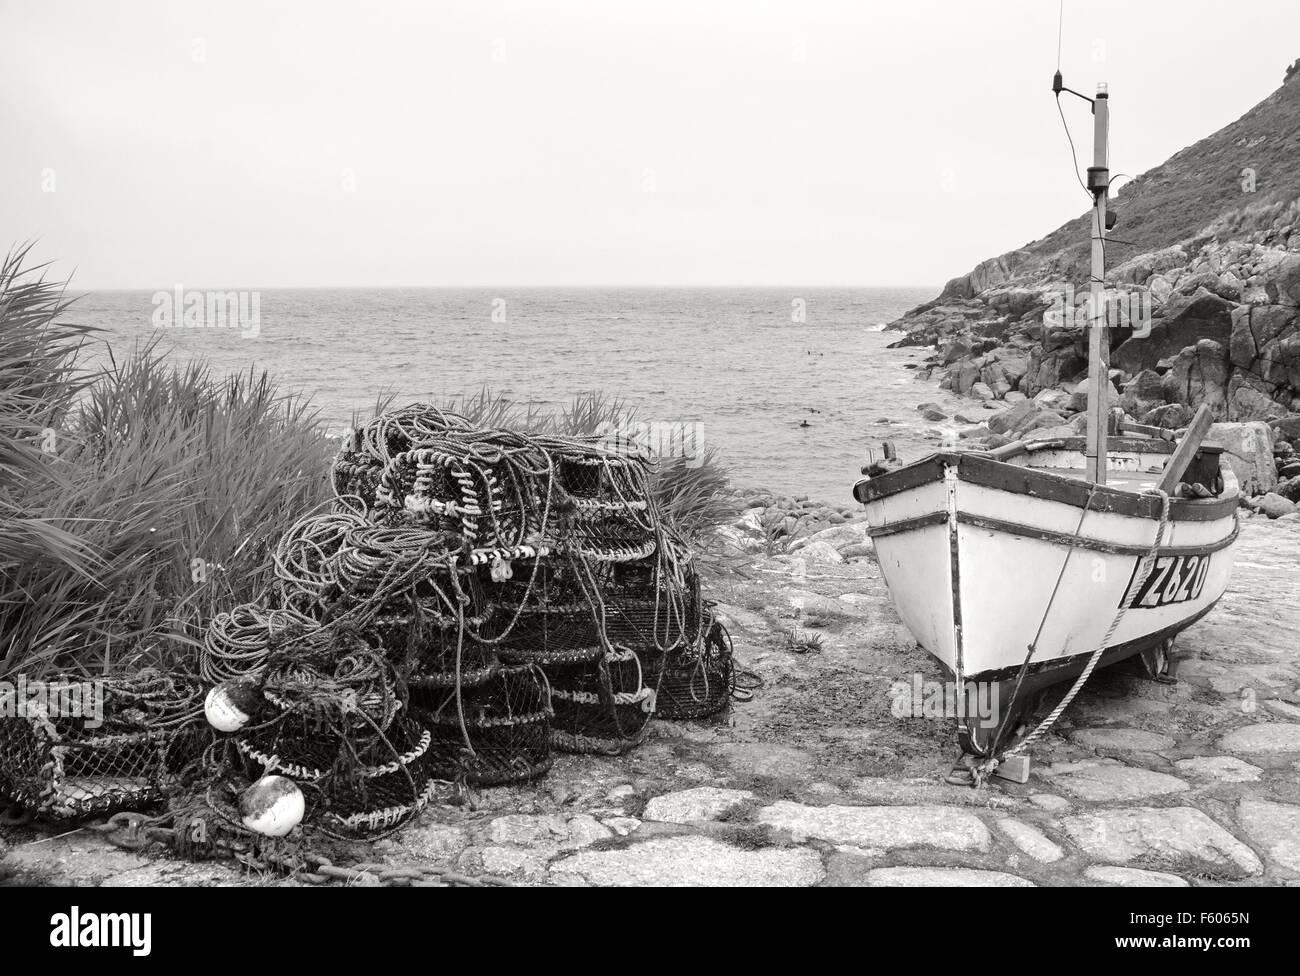 Fishing boat and lobster pots in Penberth cove a hamlet near Penzance in Cornwall coast boats, bay, beach, boats, - Stock Image